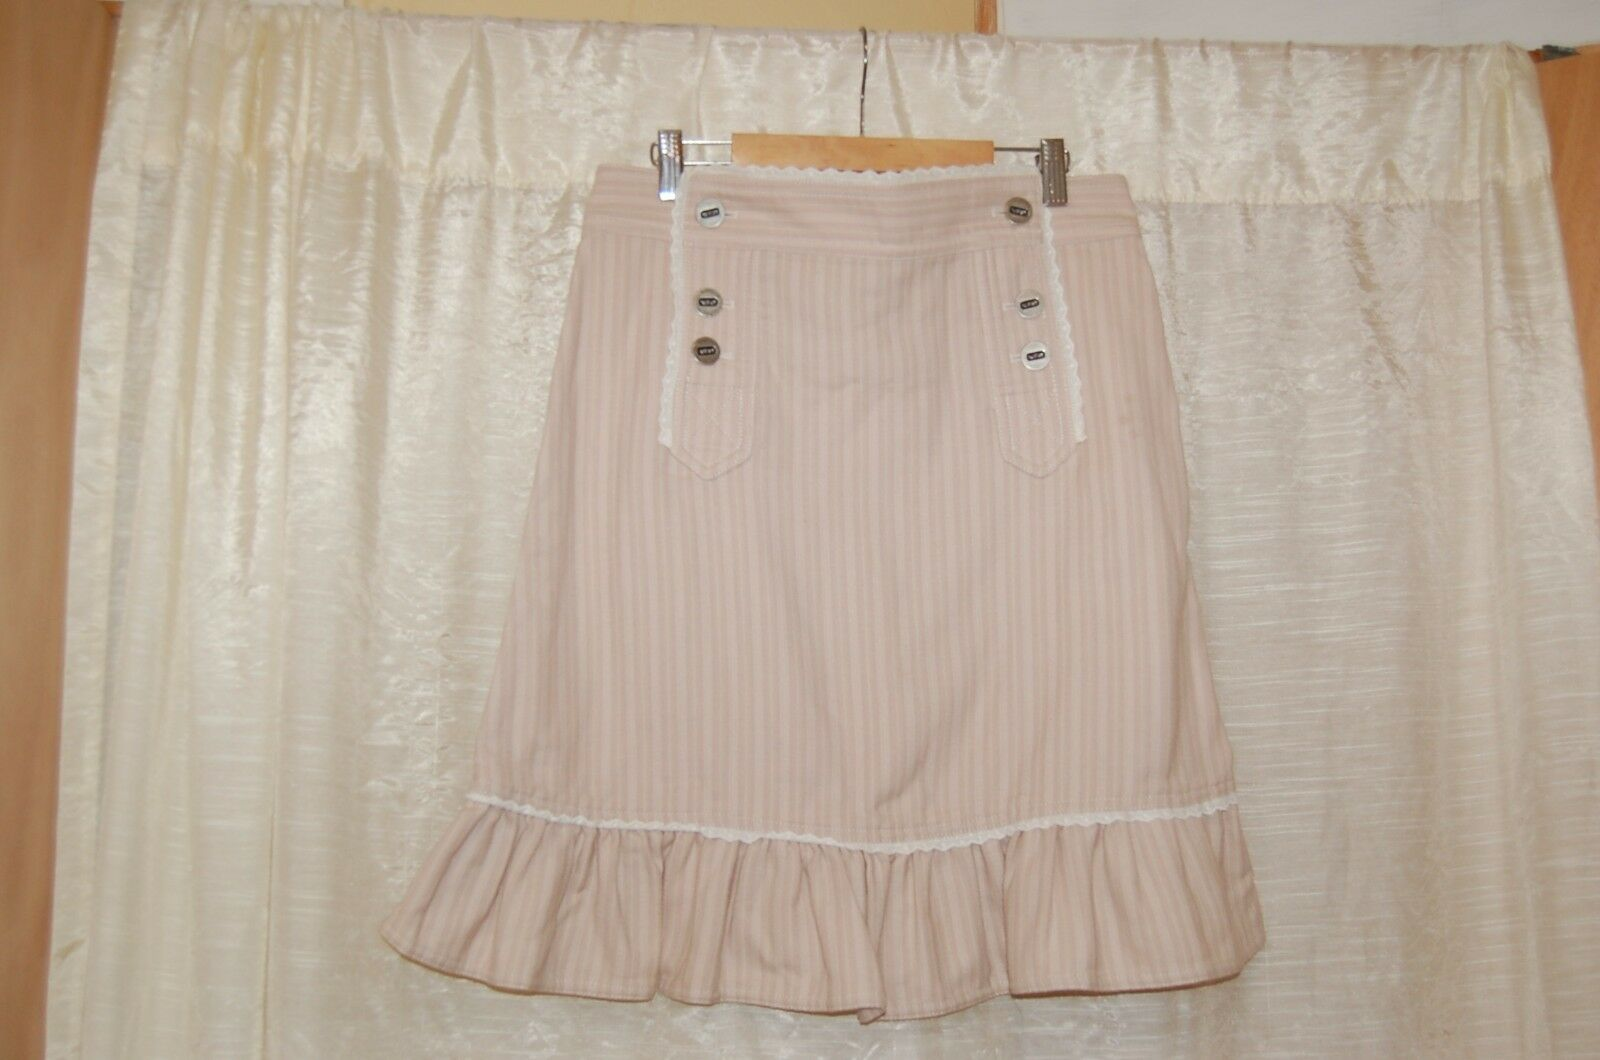 Marc Jacobs Beige Cotton Skirt Size 4